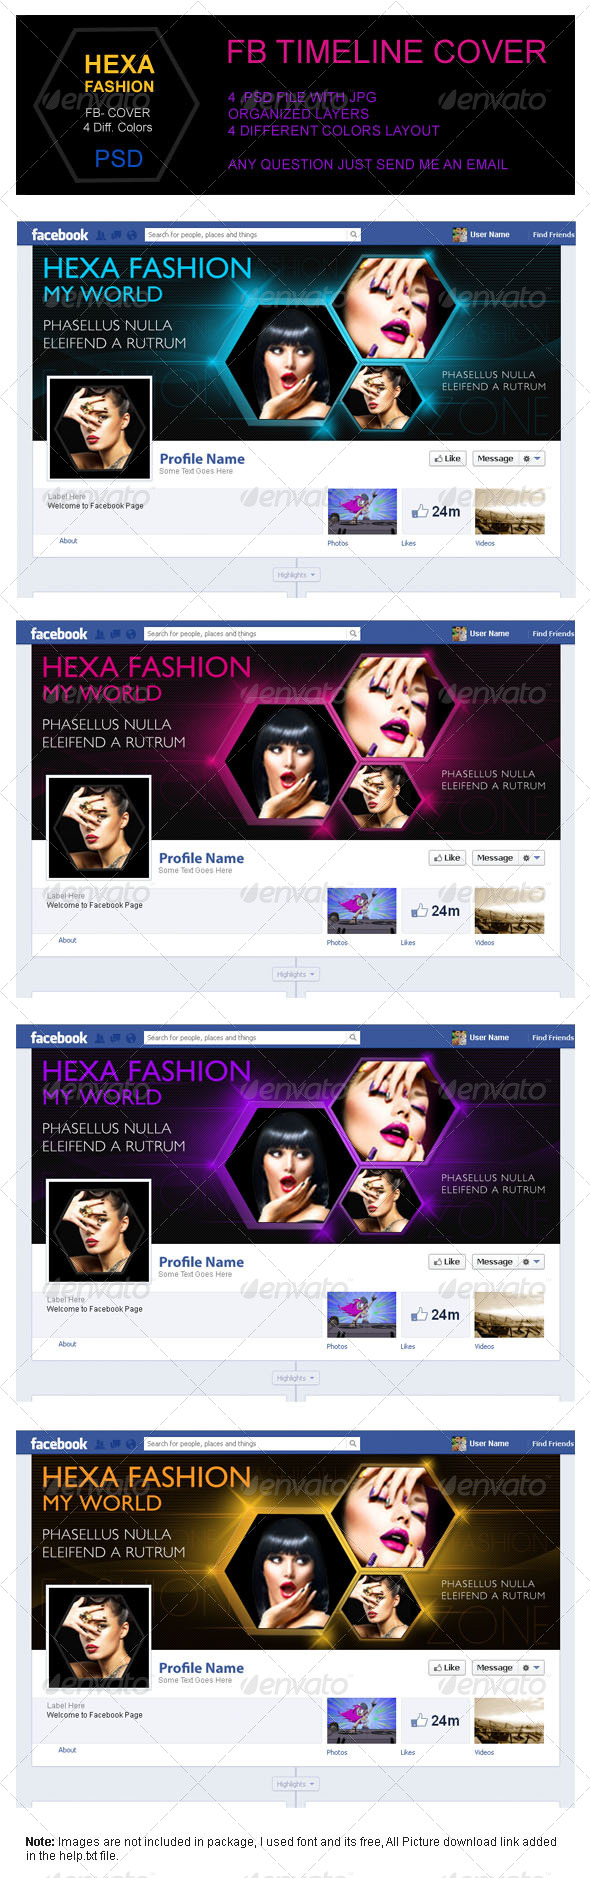 Hexa Fashion FB Timeline Cover - Facebook Timeline Covers Social Media